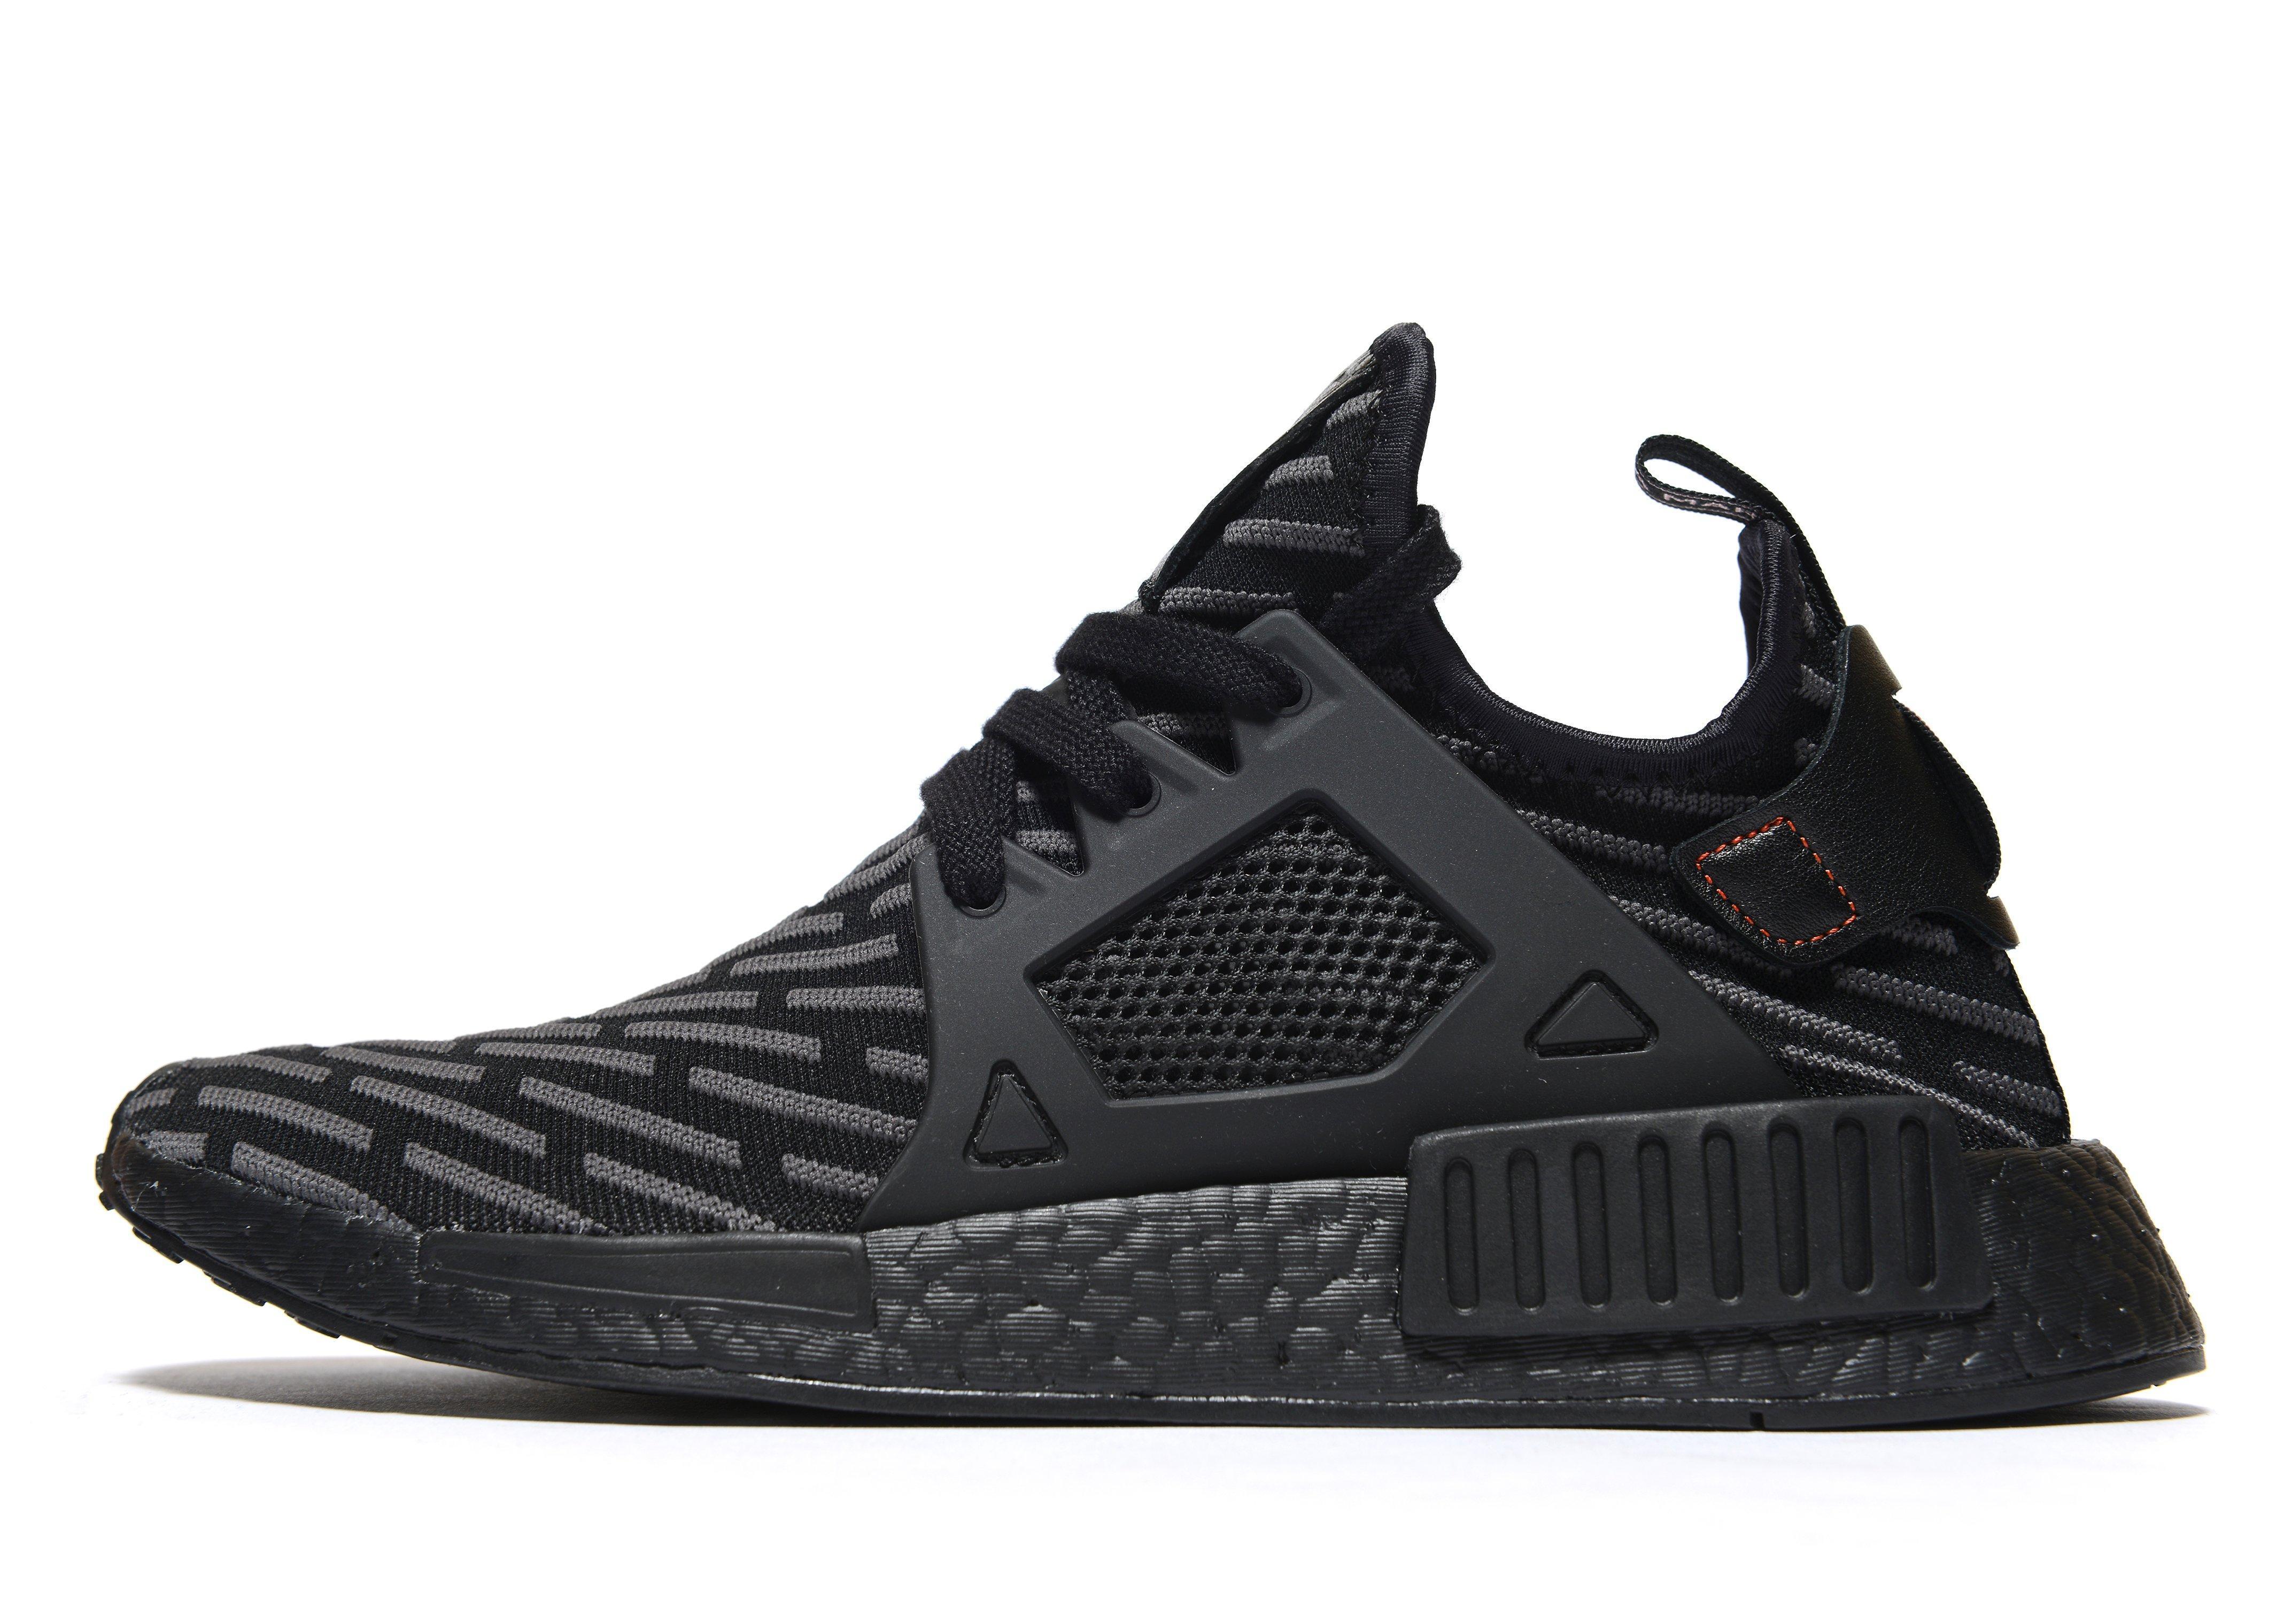 Adidas Originals Nmd Xr1 Primeknit In Black For Men Lyst